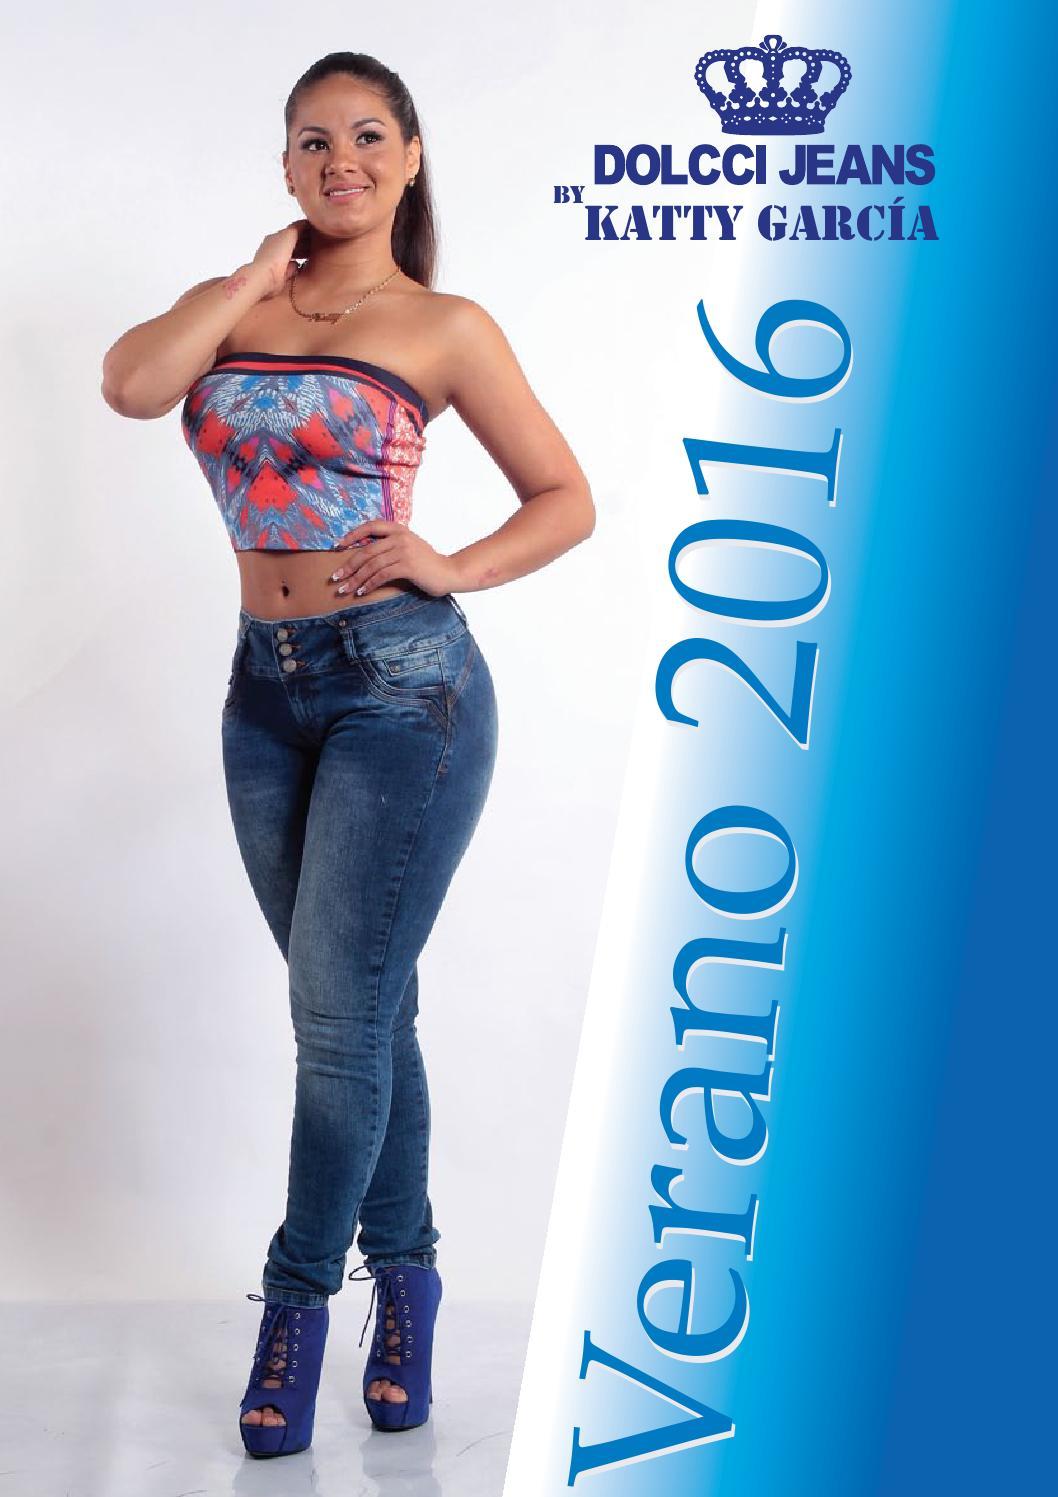 Nueva colecciu00f3n Verano 2016!! by Dolcci Jeans by Katty Garcia - Issuu